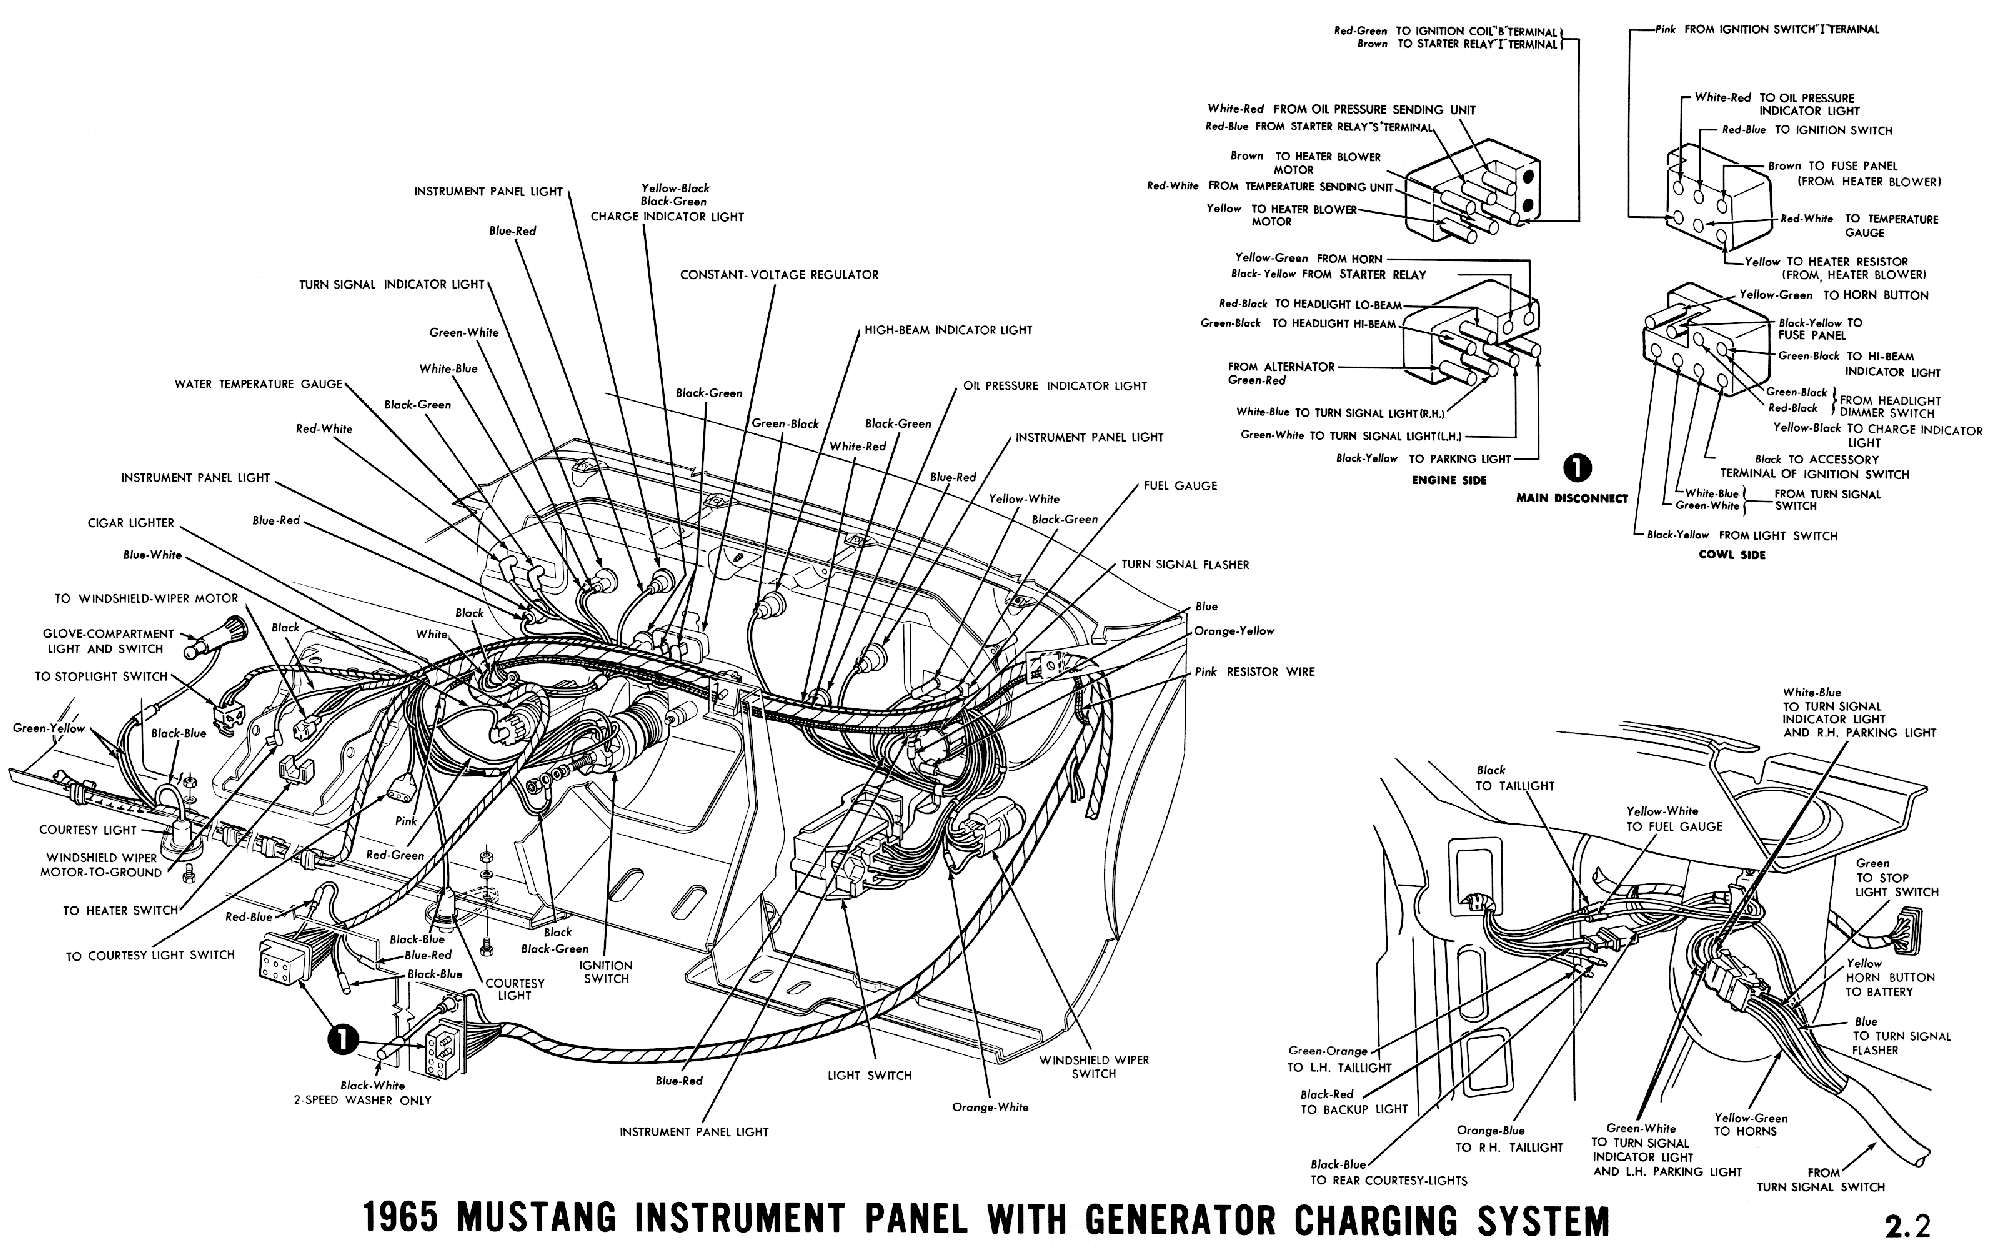 1965 Mustang Wiring Diagrams - Average Joe Restoration - 65 Mustang Wiring Diagram